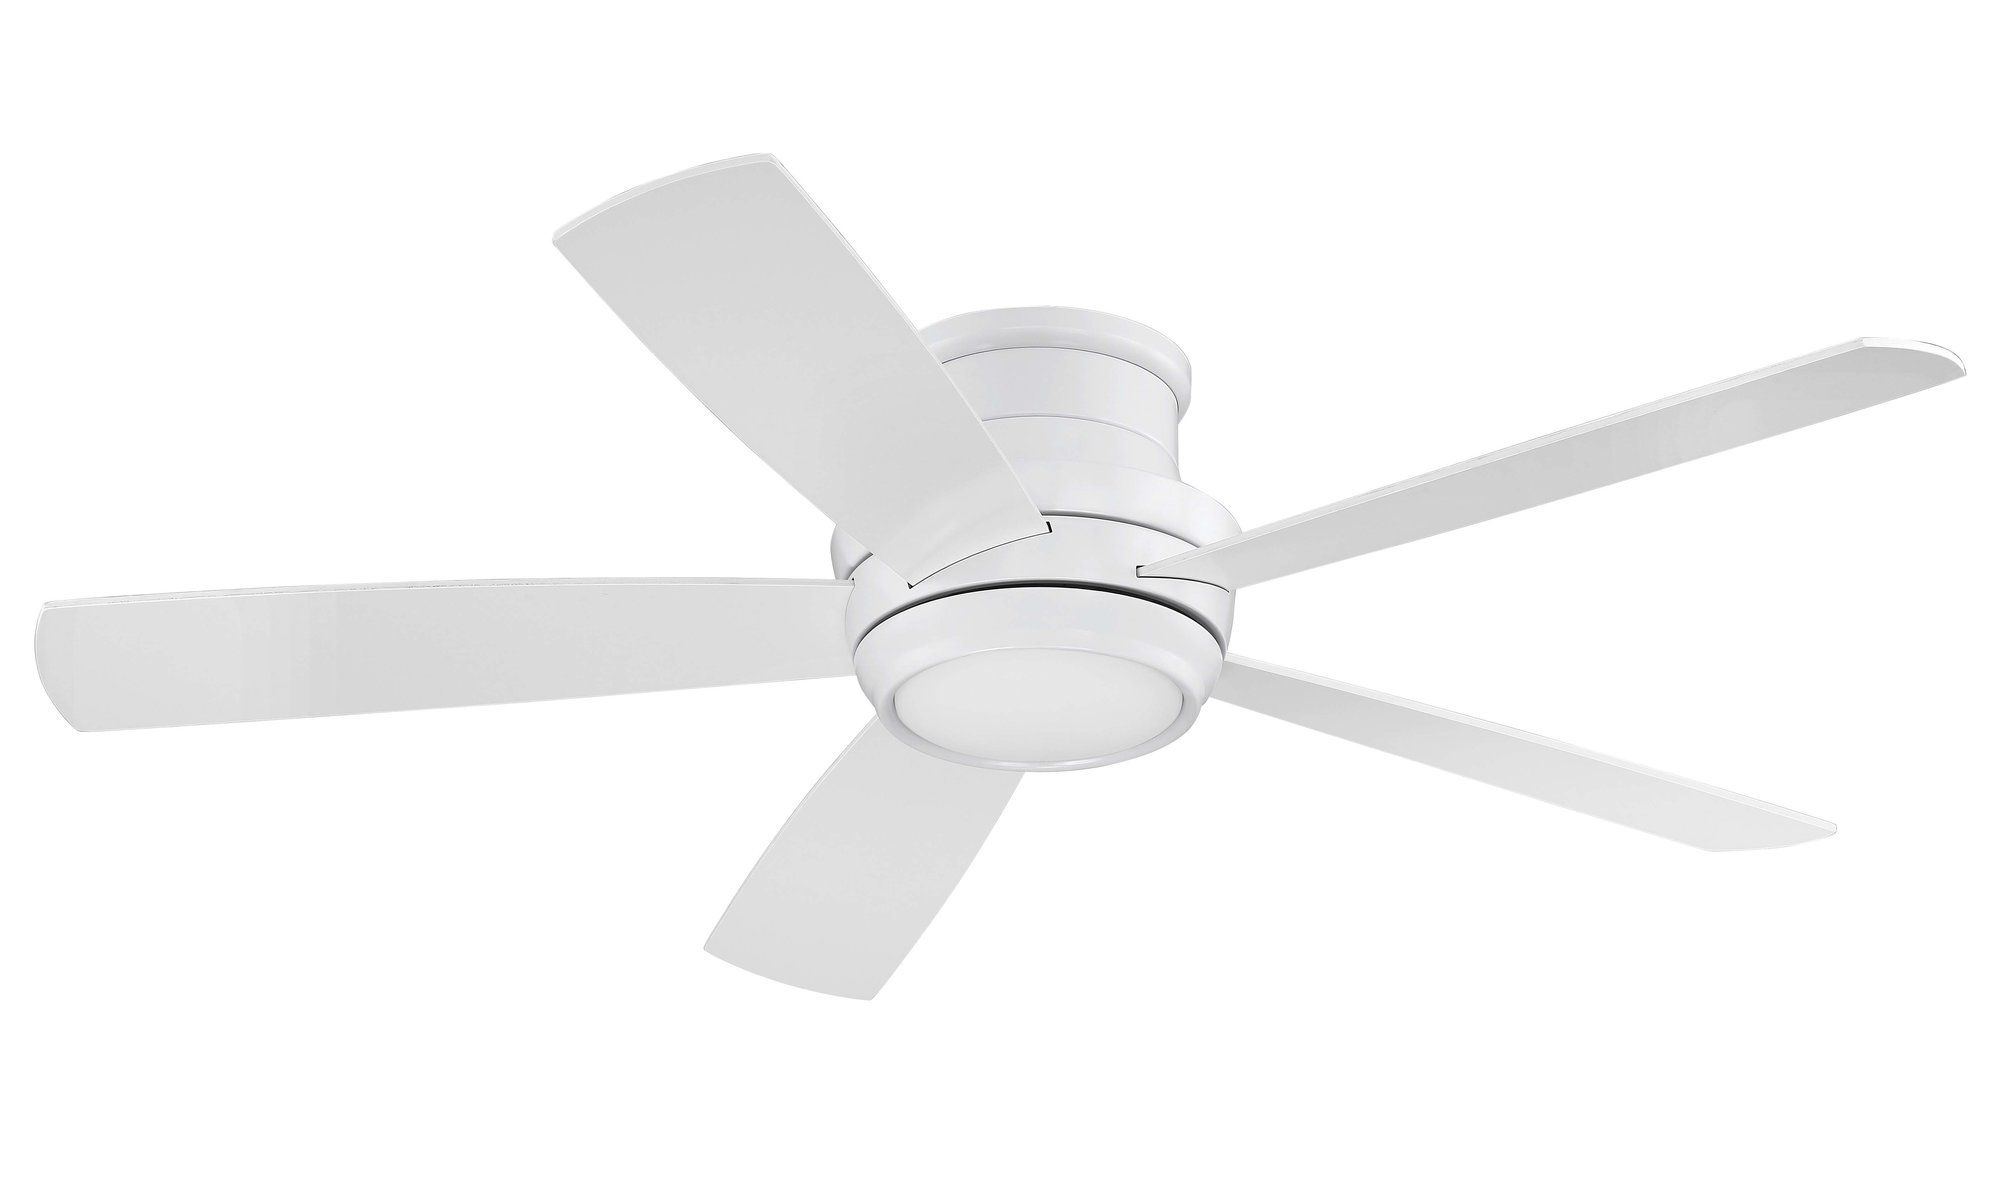 "52"" Cedarton Hugger 5 Blade Ceiling Fan With Remote, Light Inside Preferred Cedarton 5 Blade Led Ceiling Fans (View 3 of 20)"